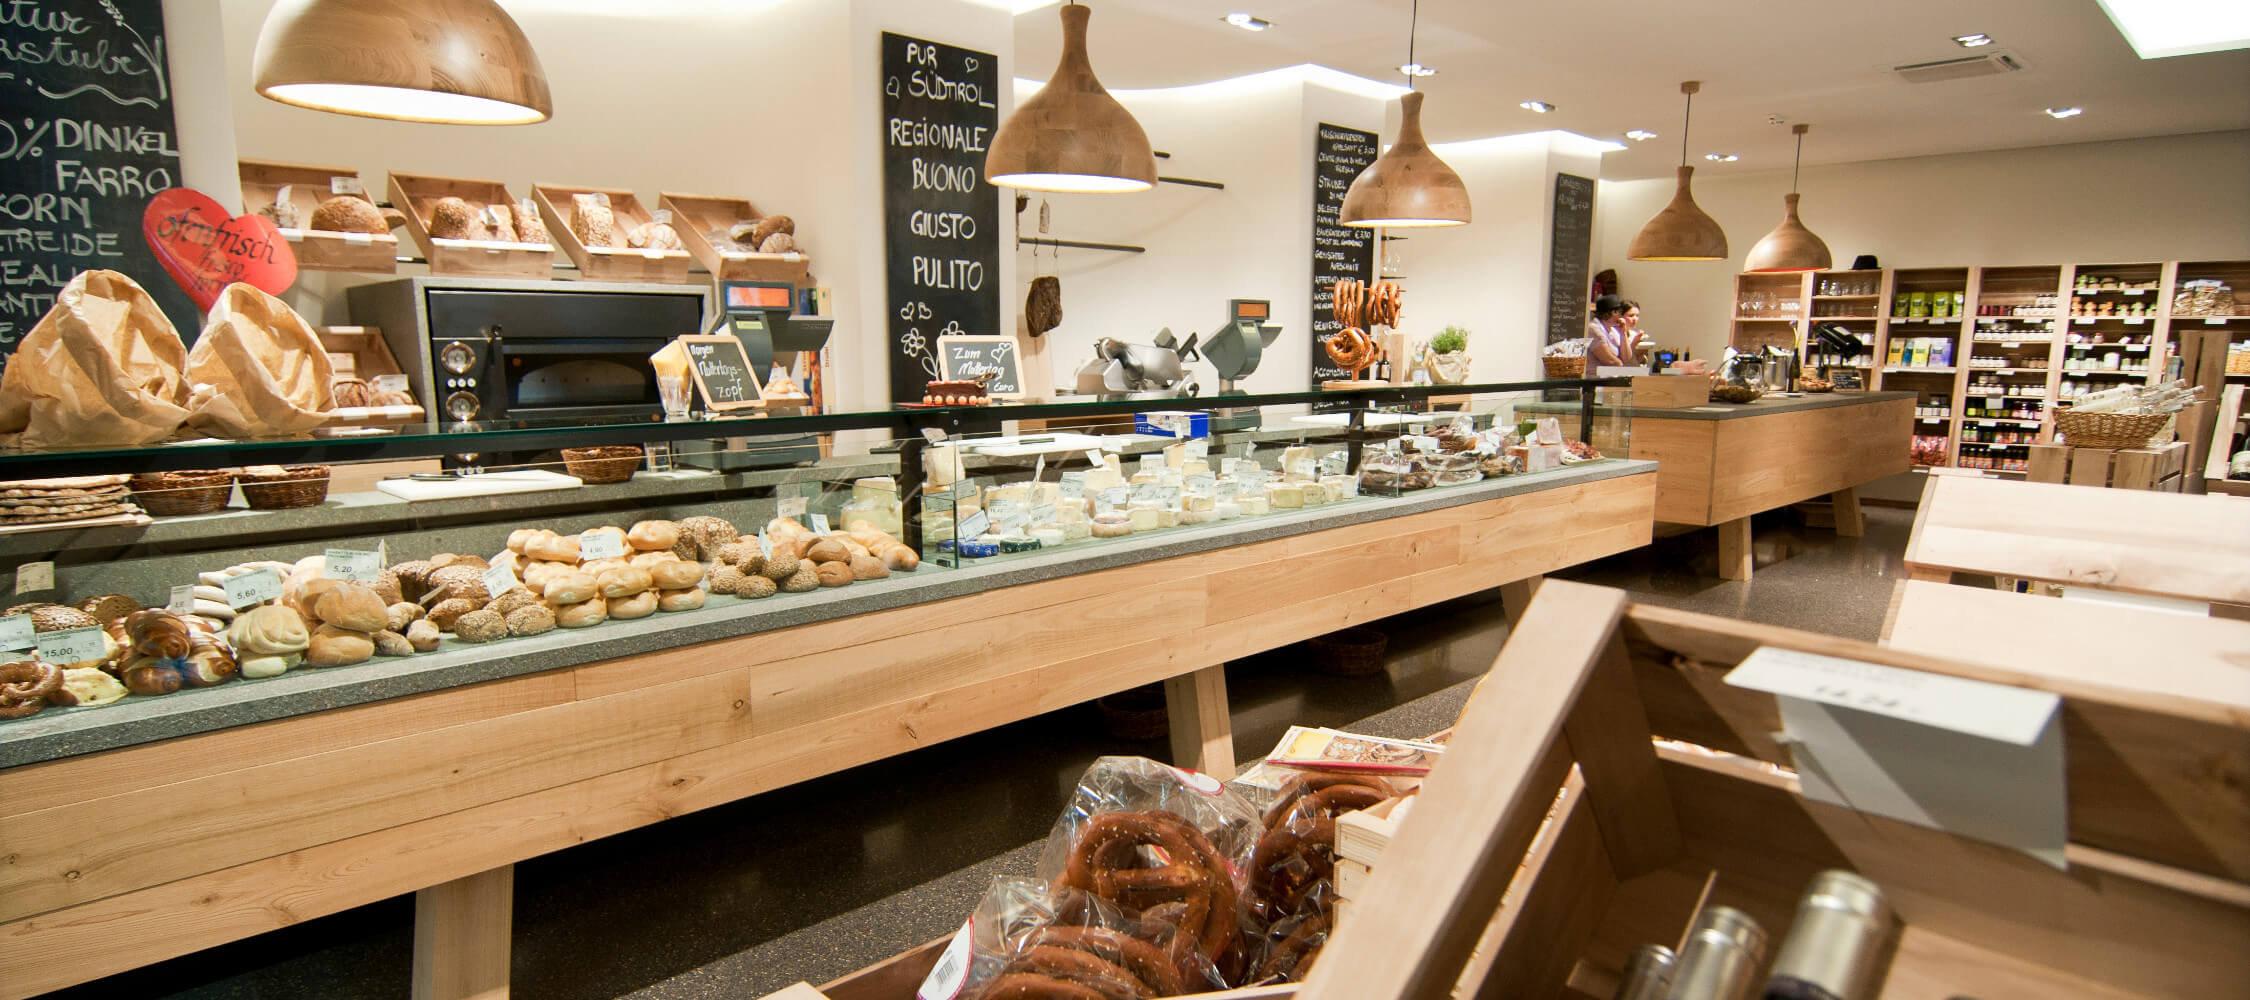 Italien-Trentino_Suedtirol_Alto_Adige_Merano_Meran_Produkte_Gastronomie_Einkaufen_Shopping_Pur_Suedtirol_Alex Filz_mgm01371pusd_2250x1000